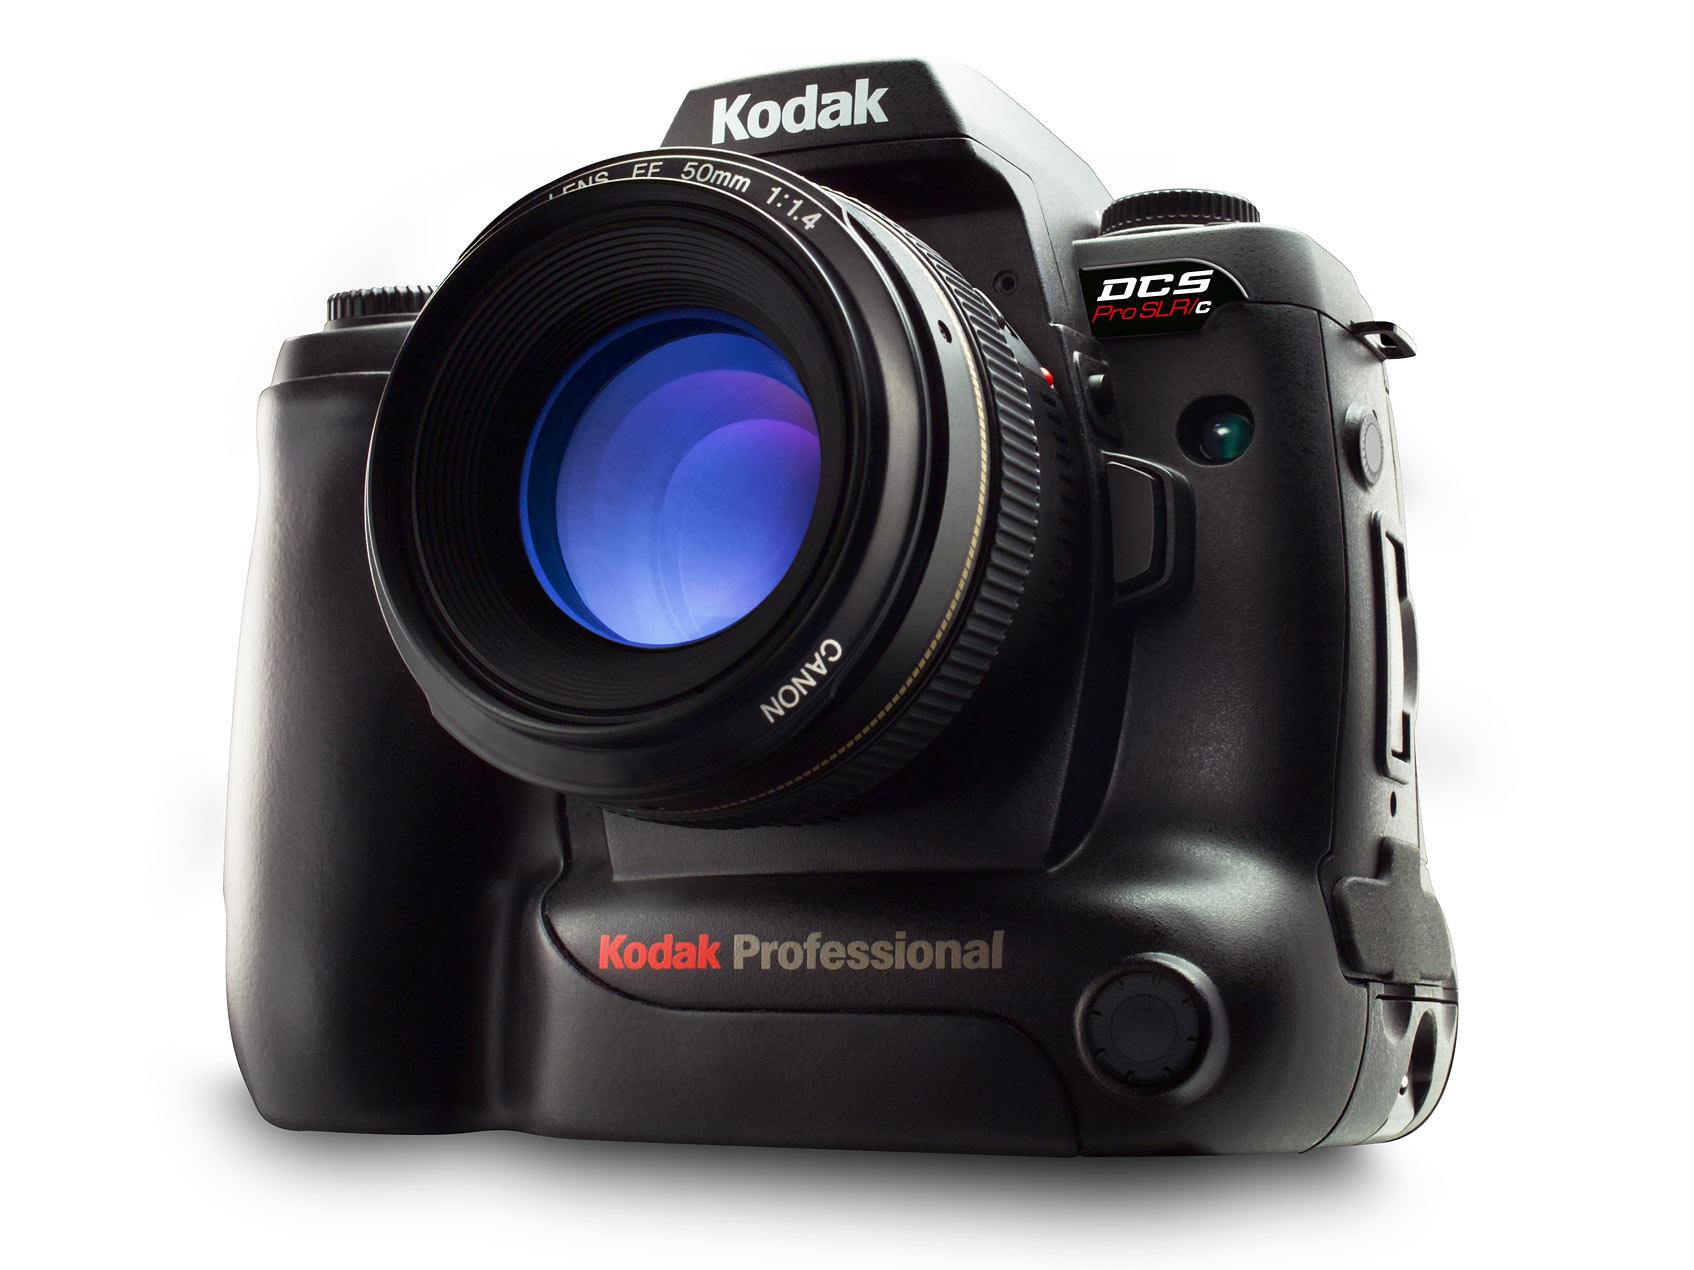 Kodak DCS Pro SLR/c, 14 mp, Canon mount: Digital Photography